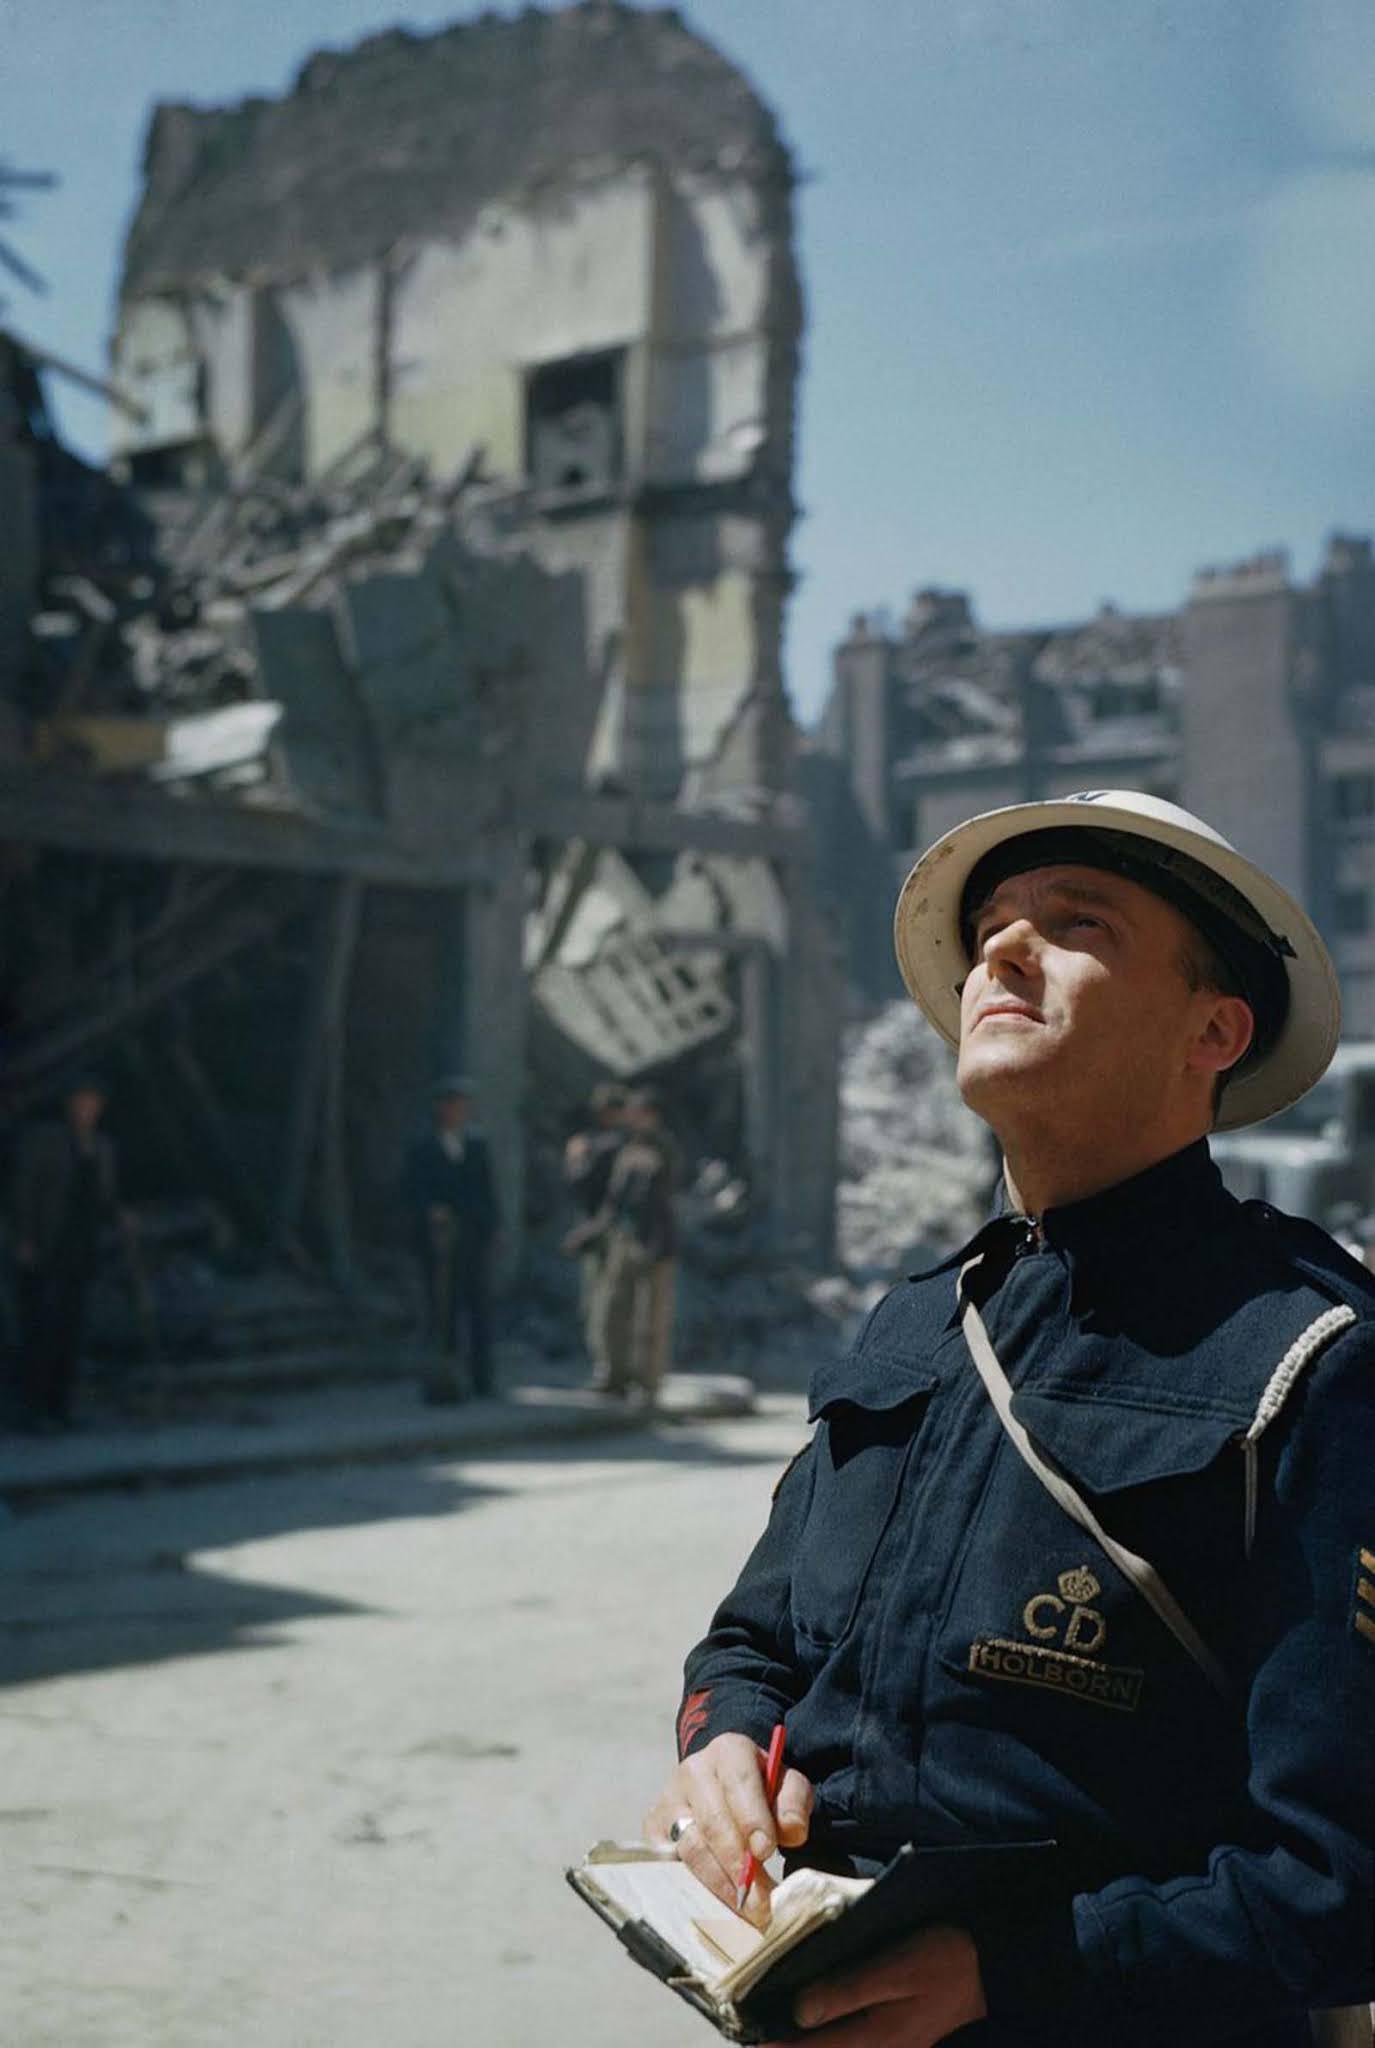 An Air Raid Precautions (ARP) warden inspects damaged buildings in Holborn, London. 1941.